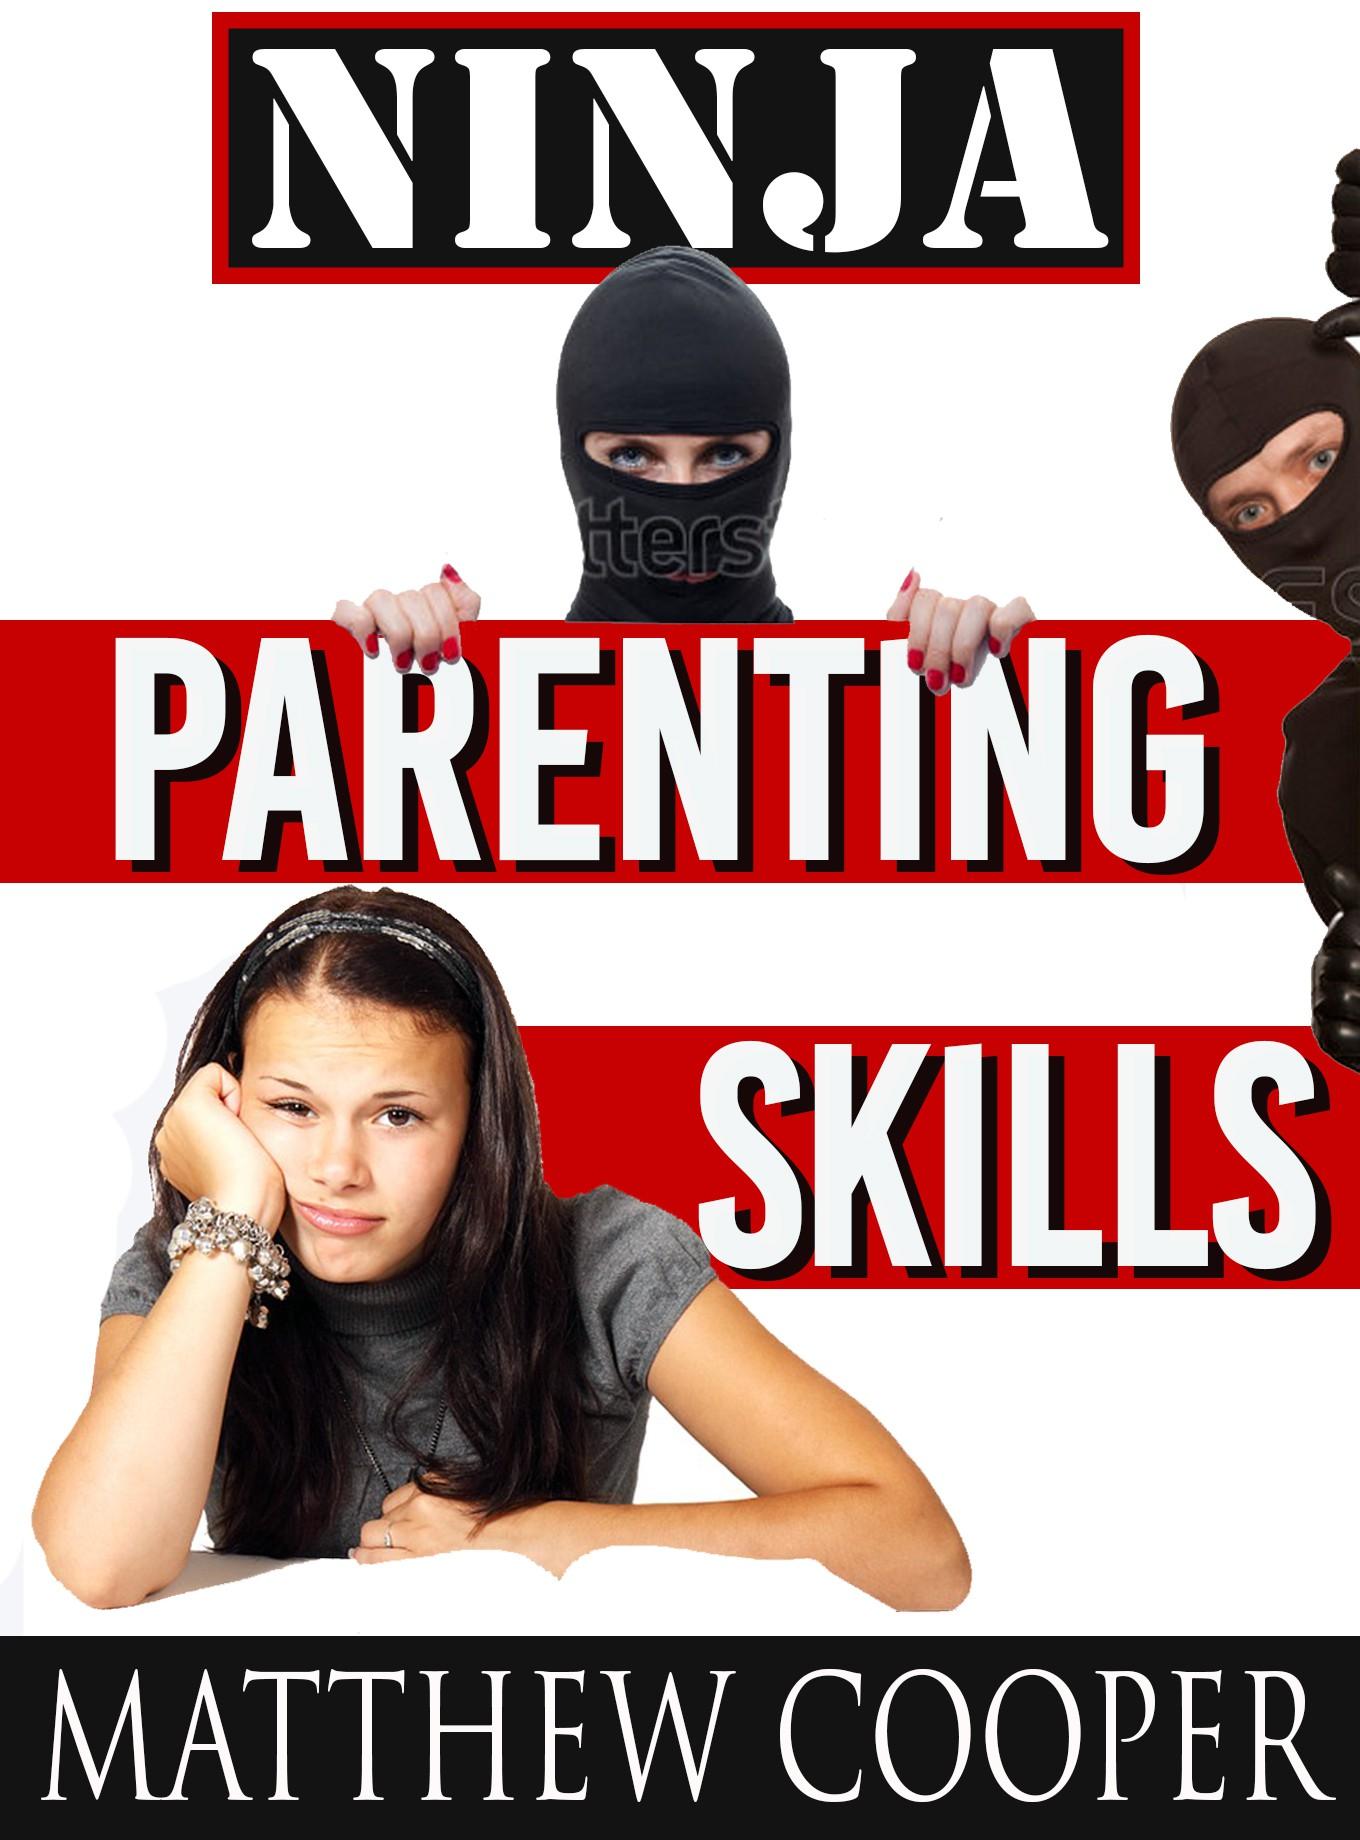 Book cover design for Ninja Parenting Skills